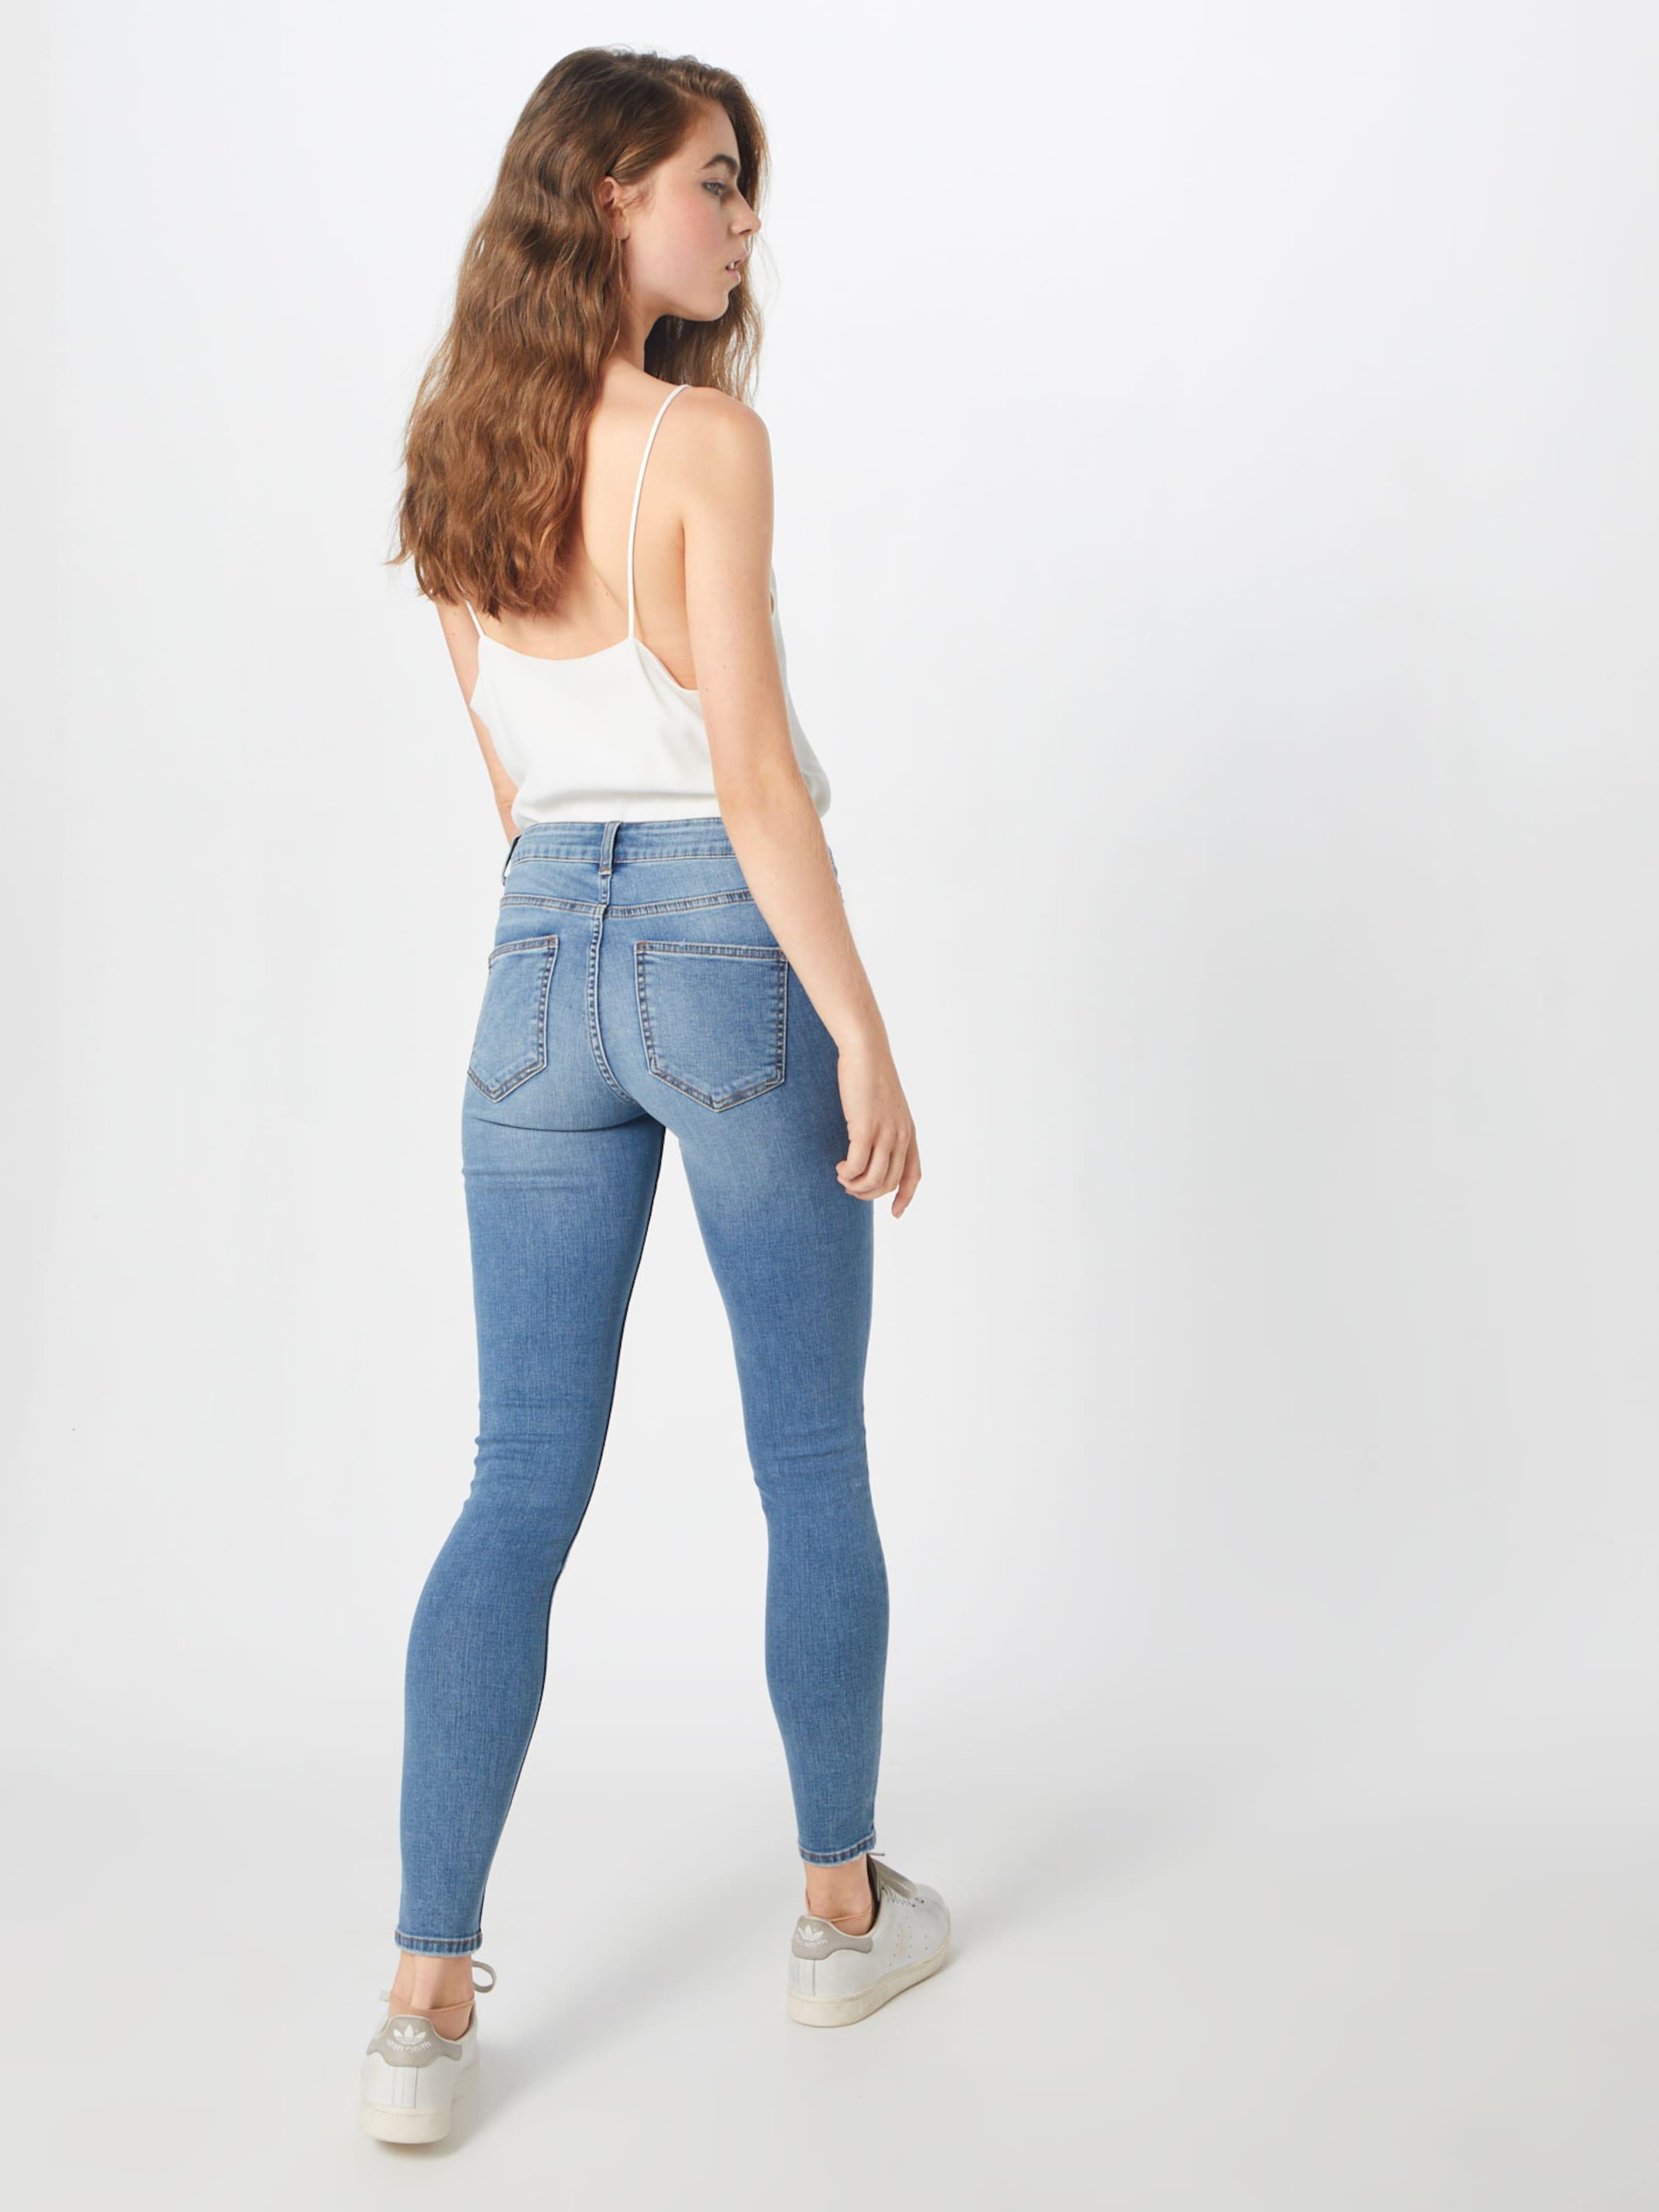 'thea' Denim Bleu Jean Pieces En pUVSzGqM